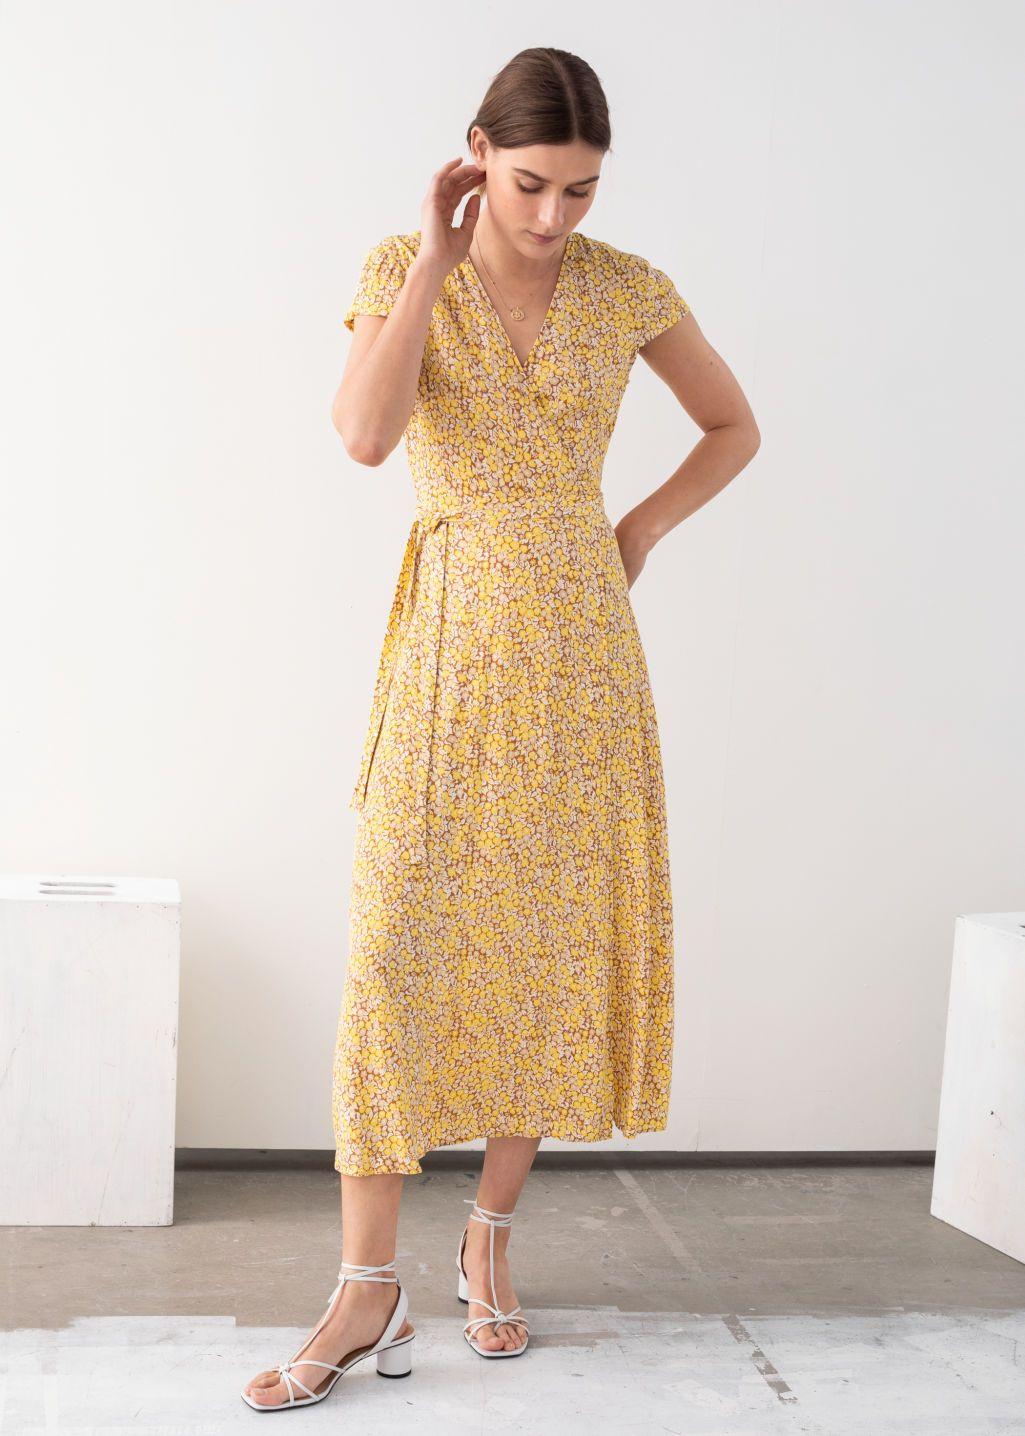 Floral Midi Wrap Dress Yellow Floral Maxi Dresses Other Stories Yellow Floral Maxi Dress Yellow Dress Dresses